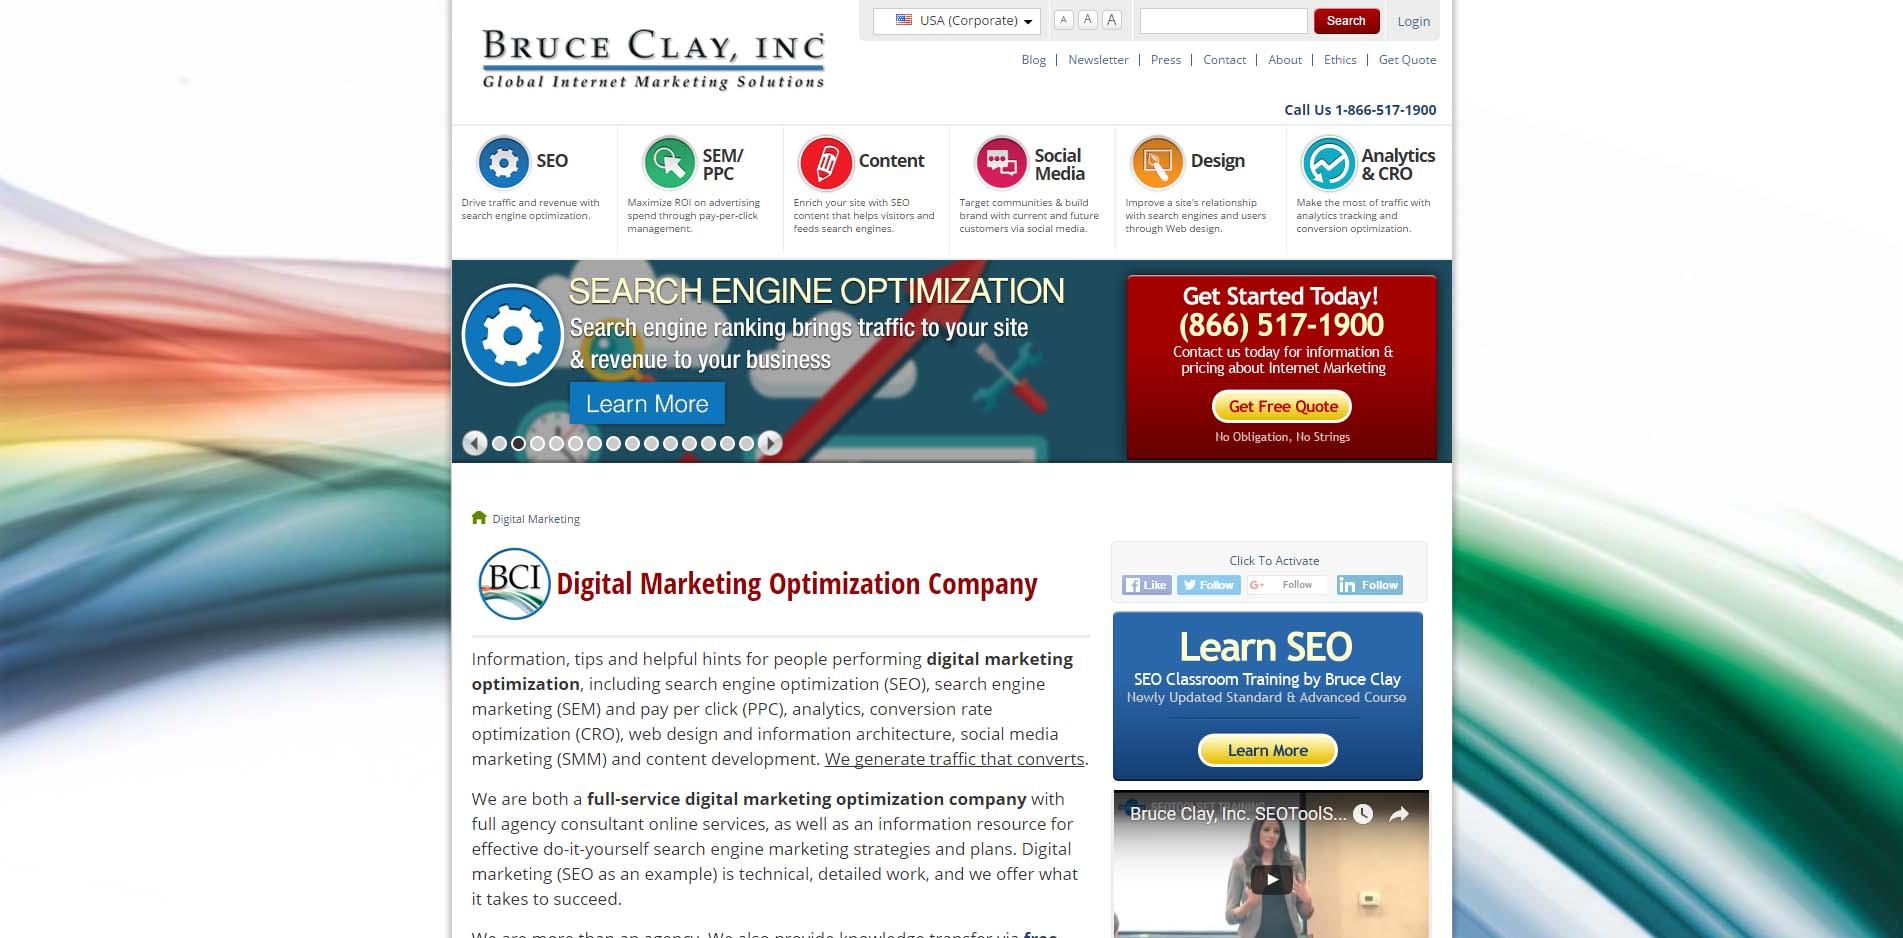 seo-blog-bruceclay-com